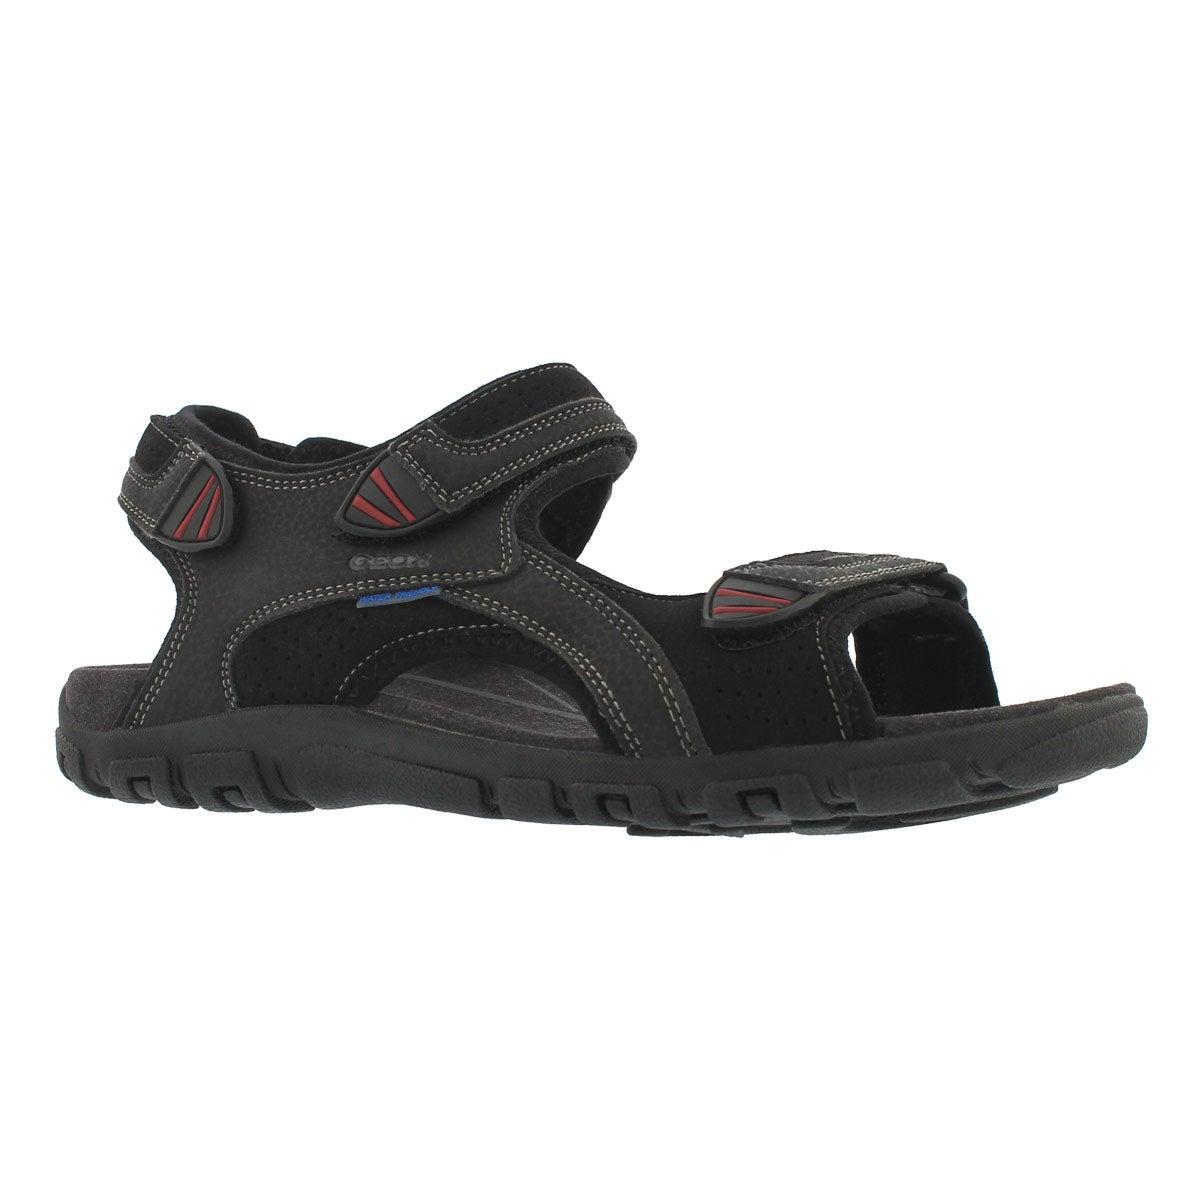 Men's STRADA WF black sport sandal